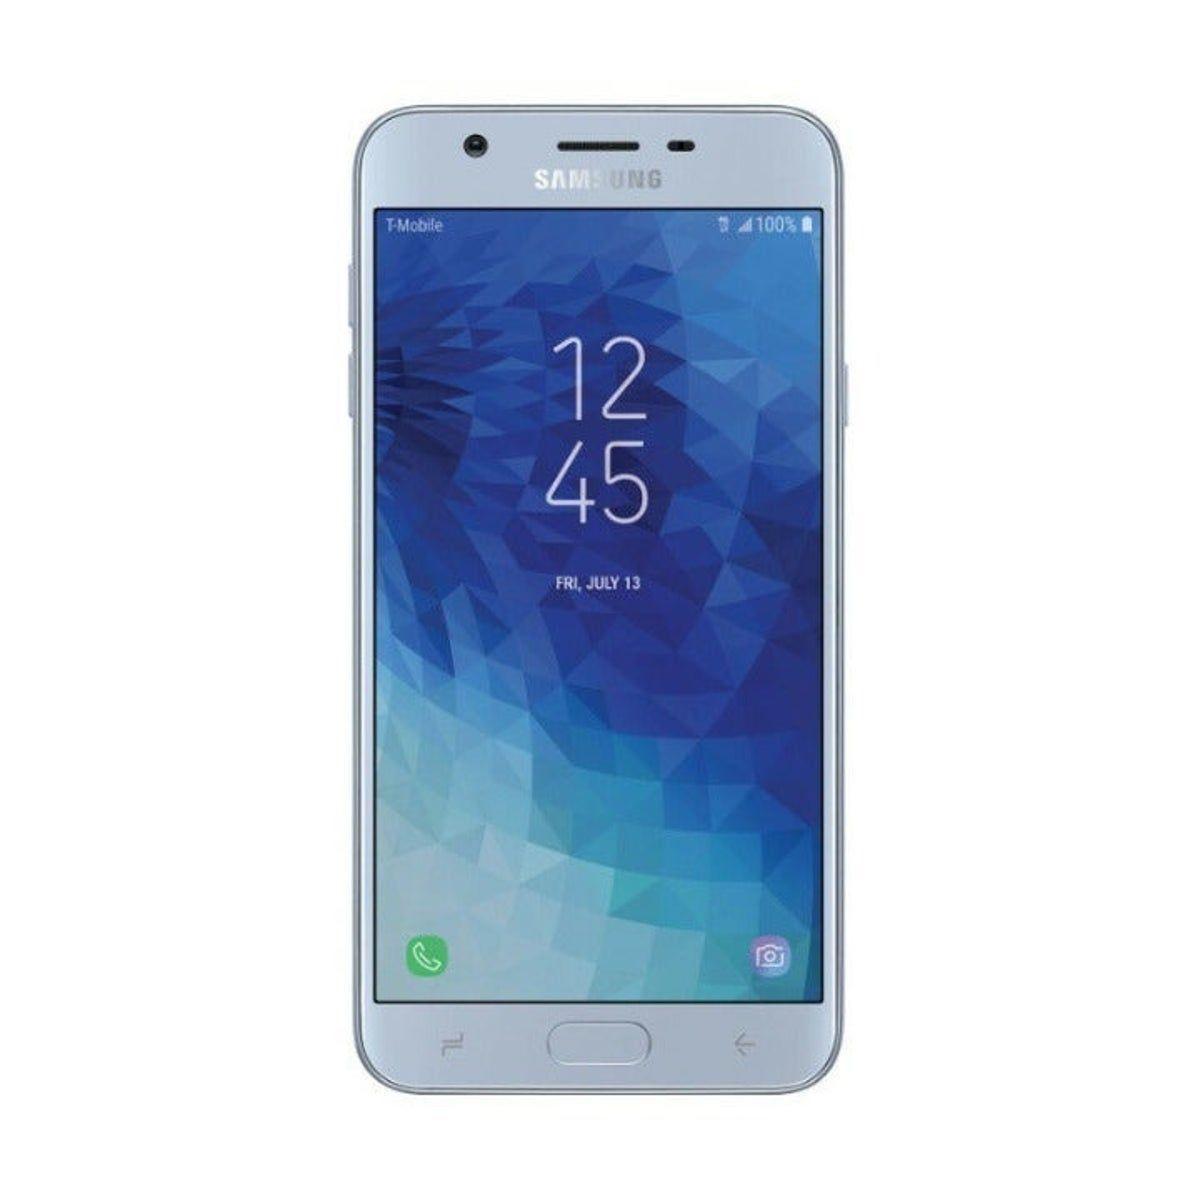 Samsung Wallpaper Galaxy A70 Samsung Galaxy Wallpaper Android Samsung Galaxy Wallpaper Samsung Wallpaper